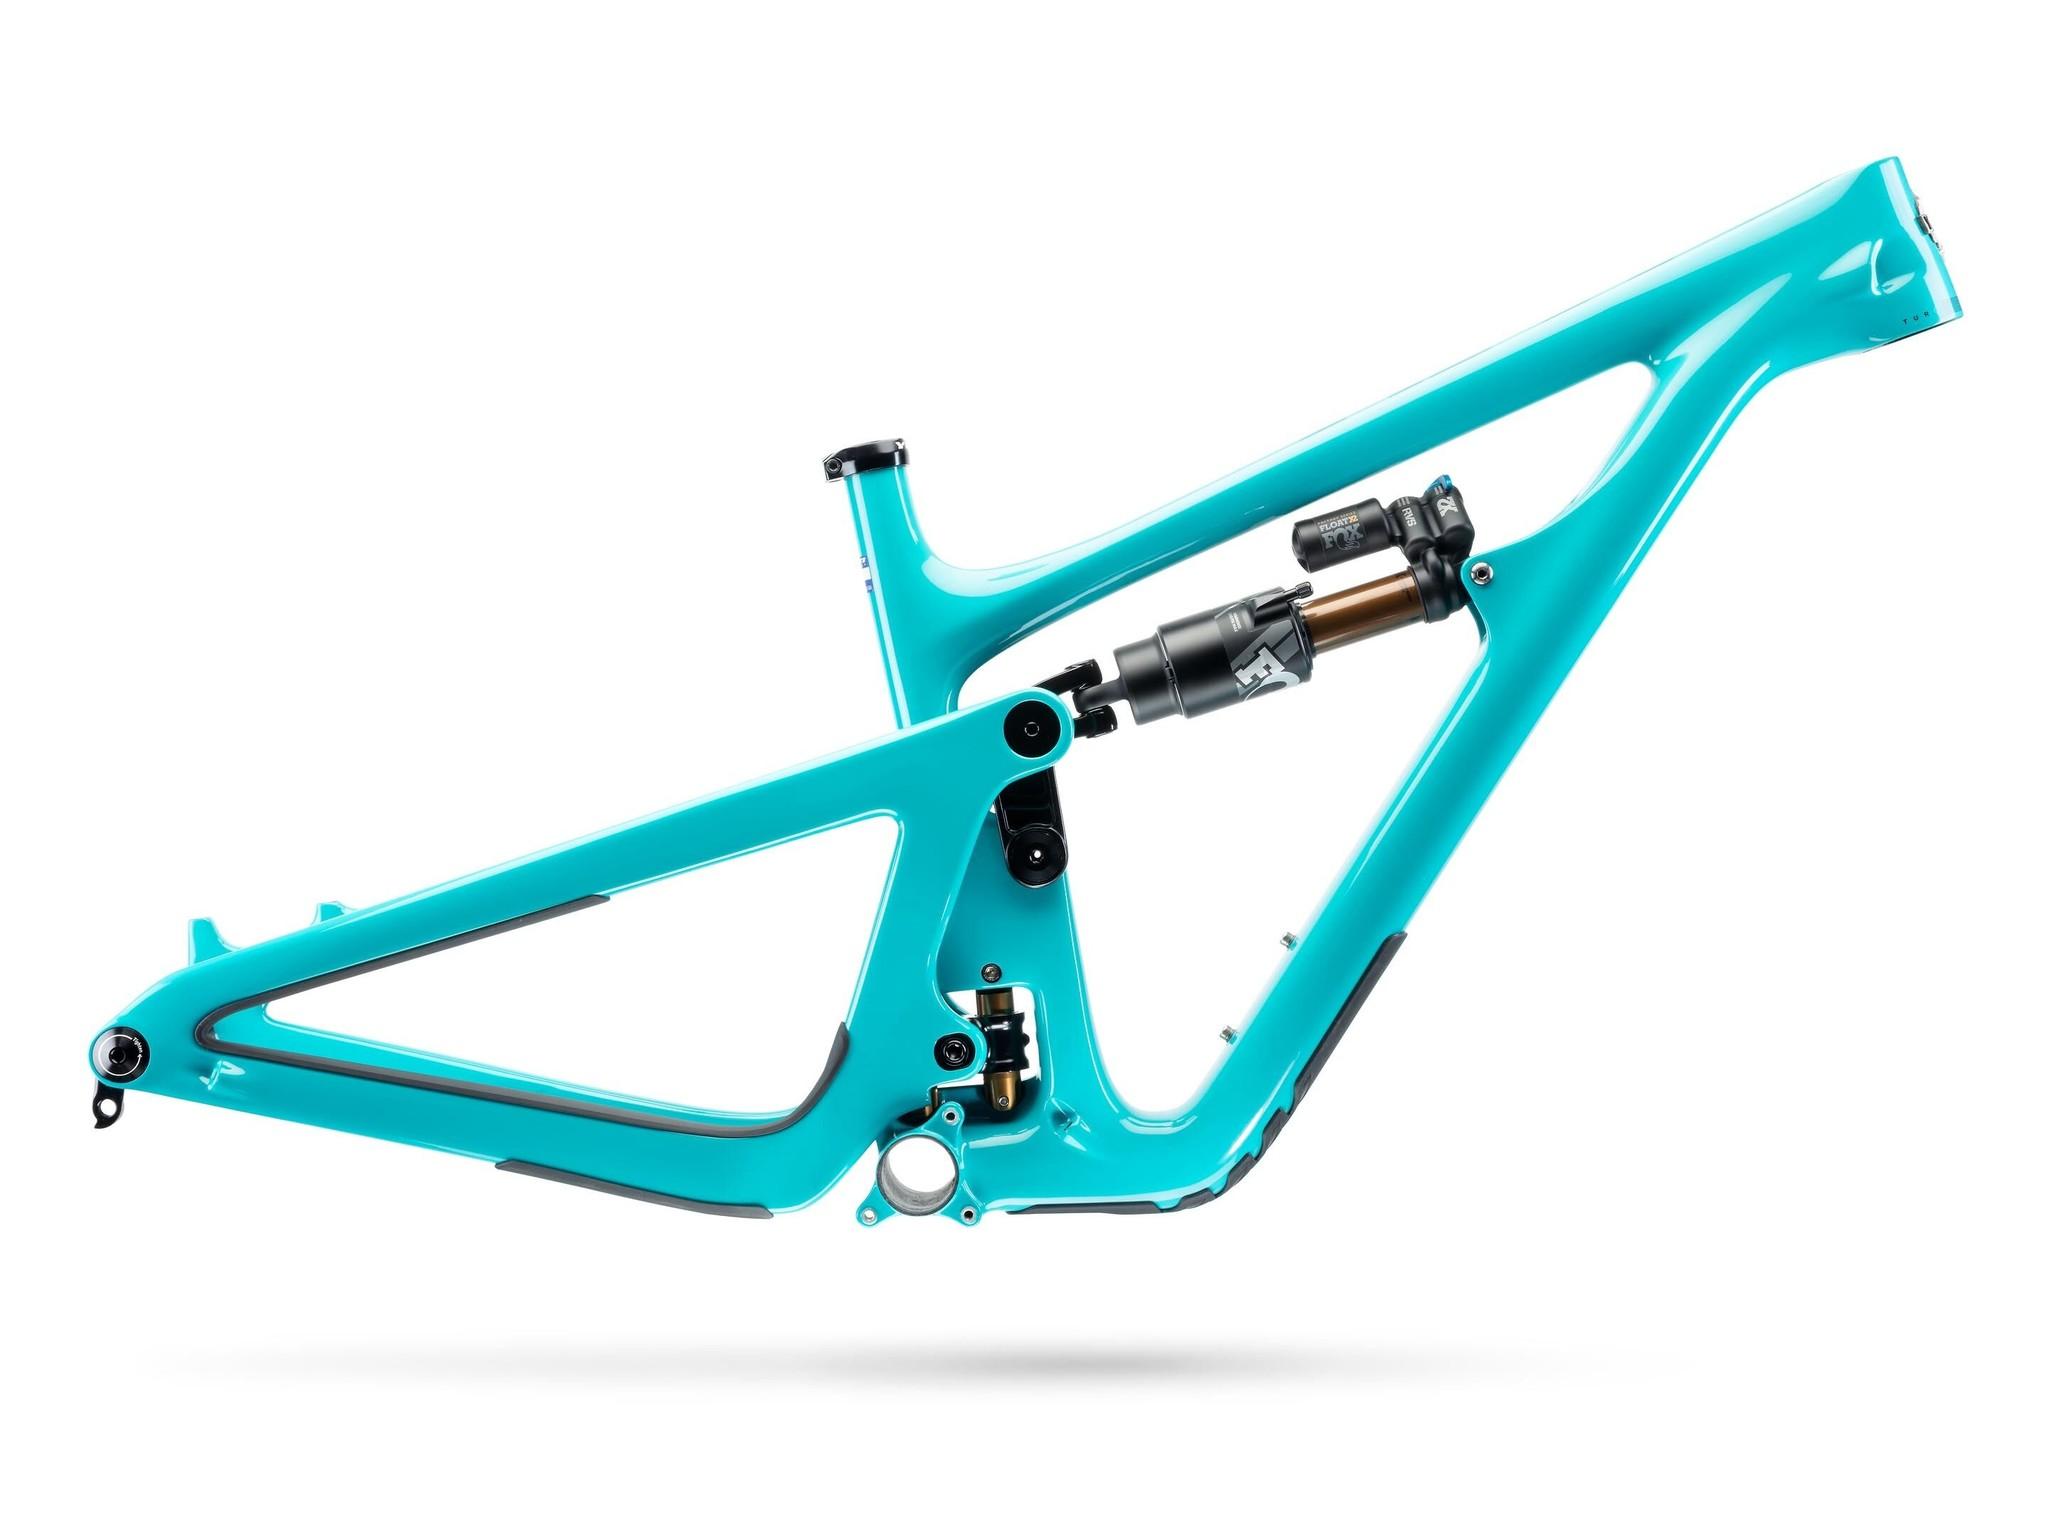 Yeti Cycles 20/21 Yeti SB150 T-series w/ T2 kit & 38 Upgrade